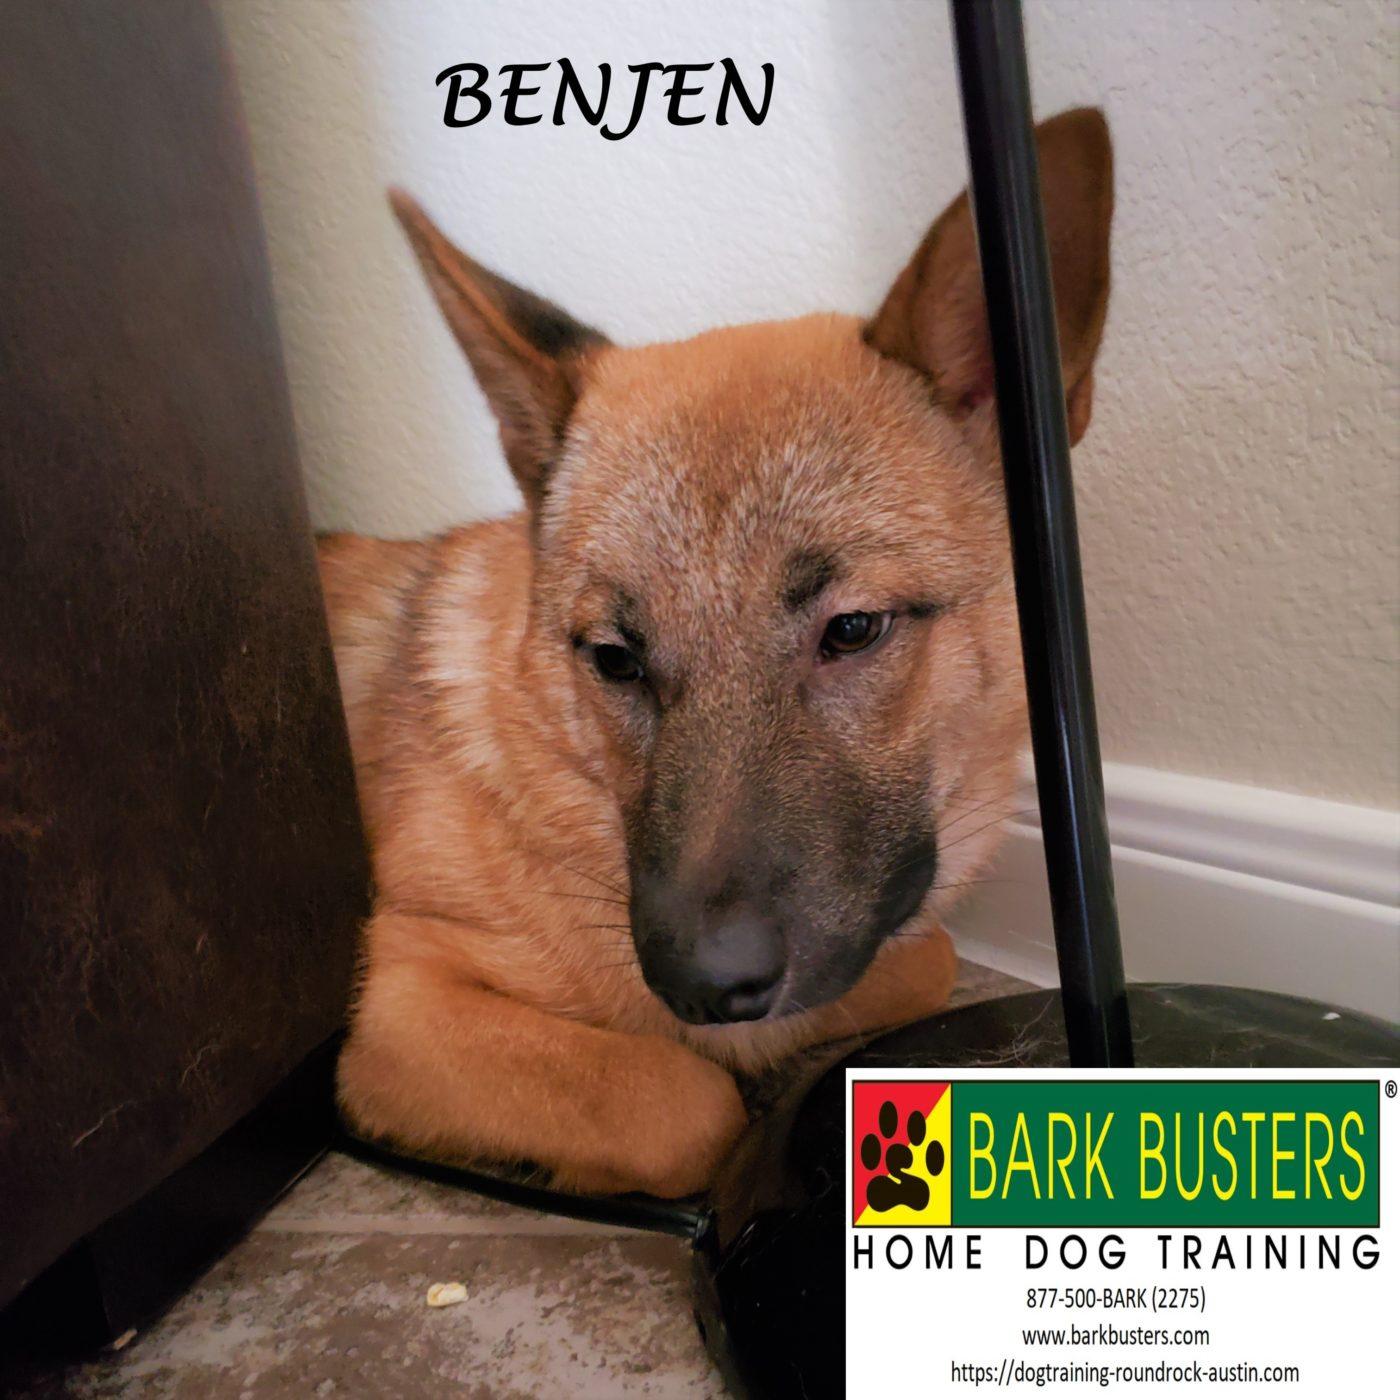 #jindo #koreandogmeattrade #rescueisbeautiful #rescuedog #dogsofbarkbusters #dogtrainingroundrock #speakdog #inhomedogtraining